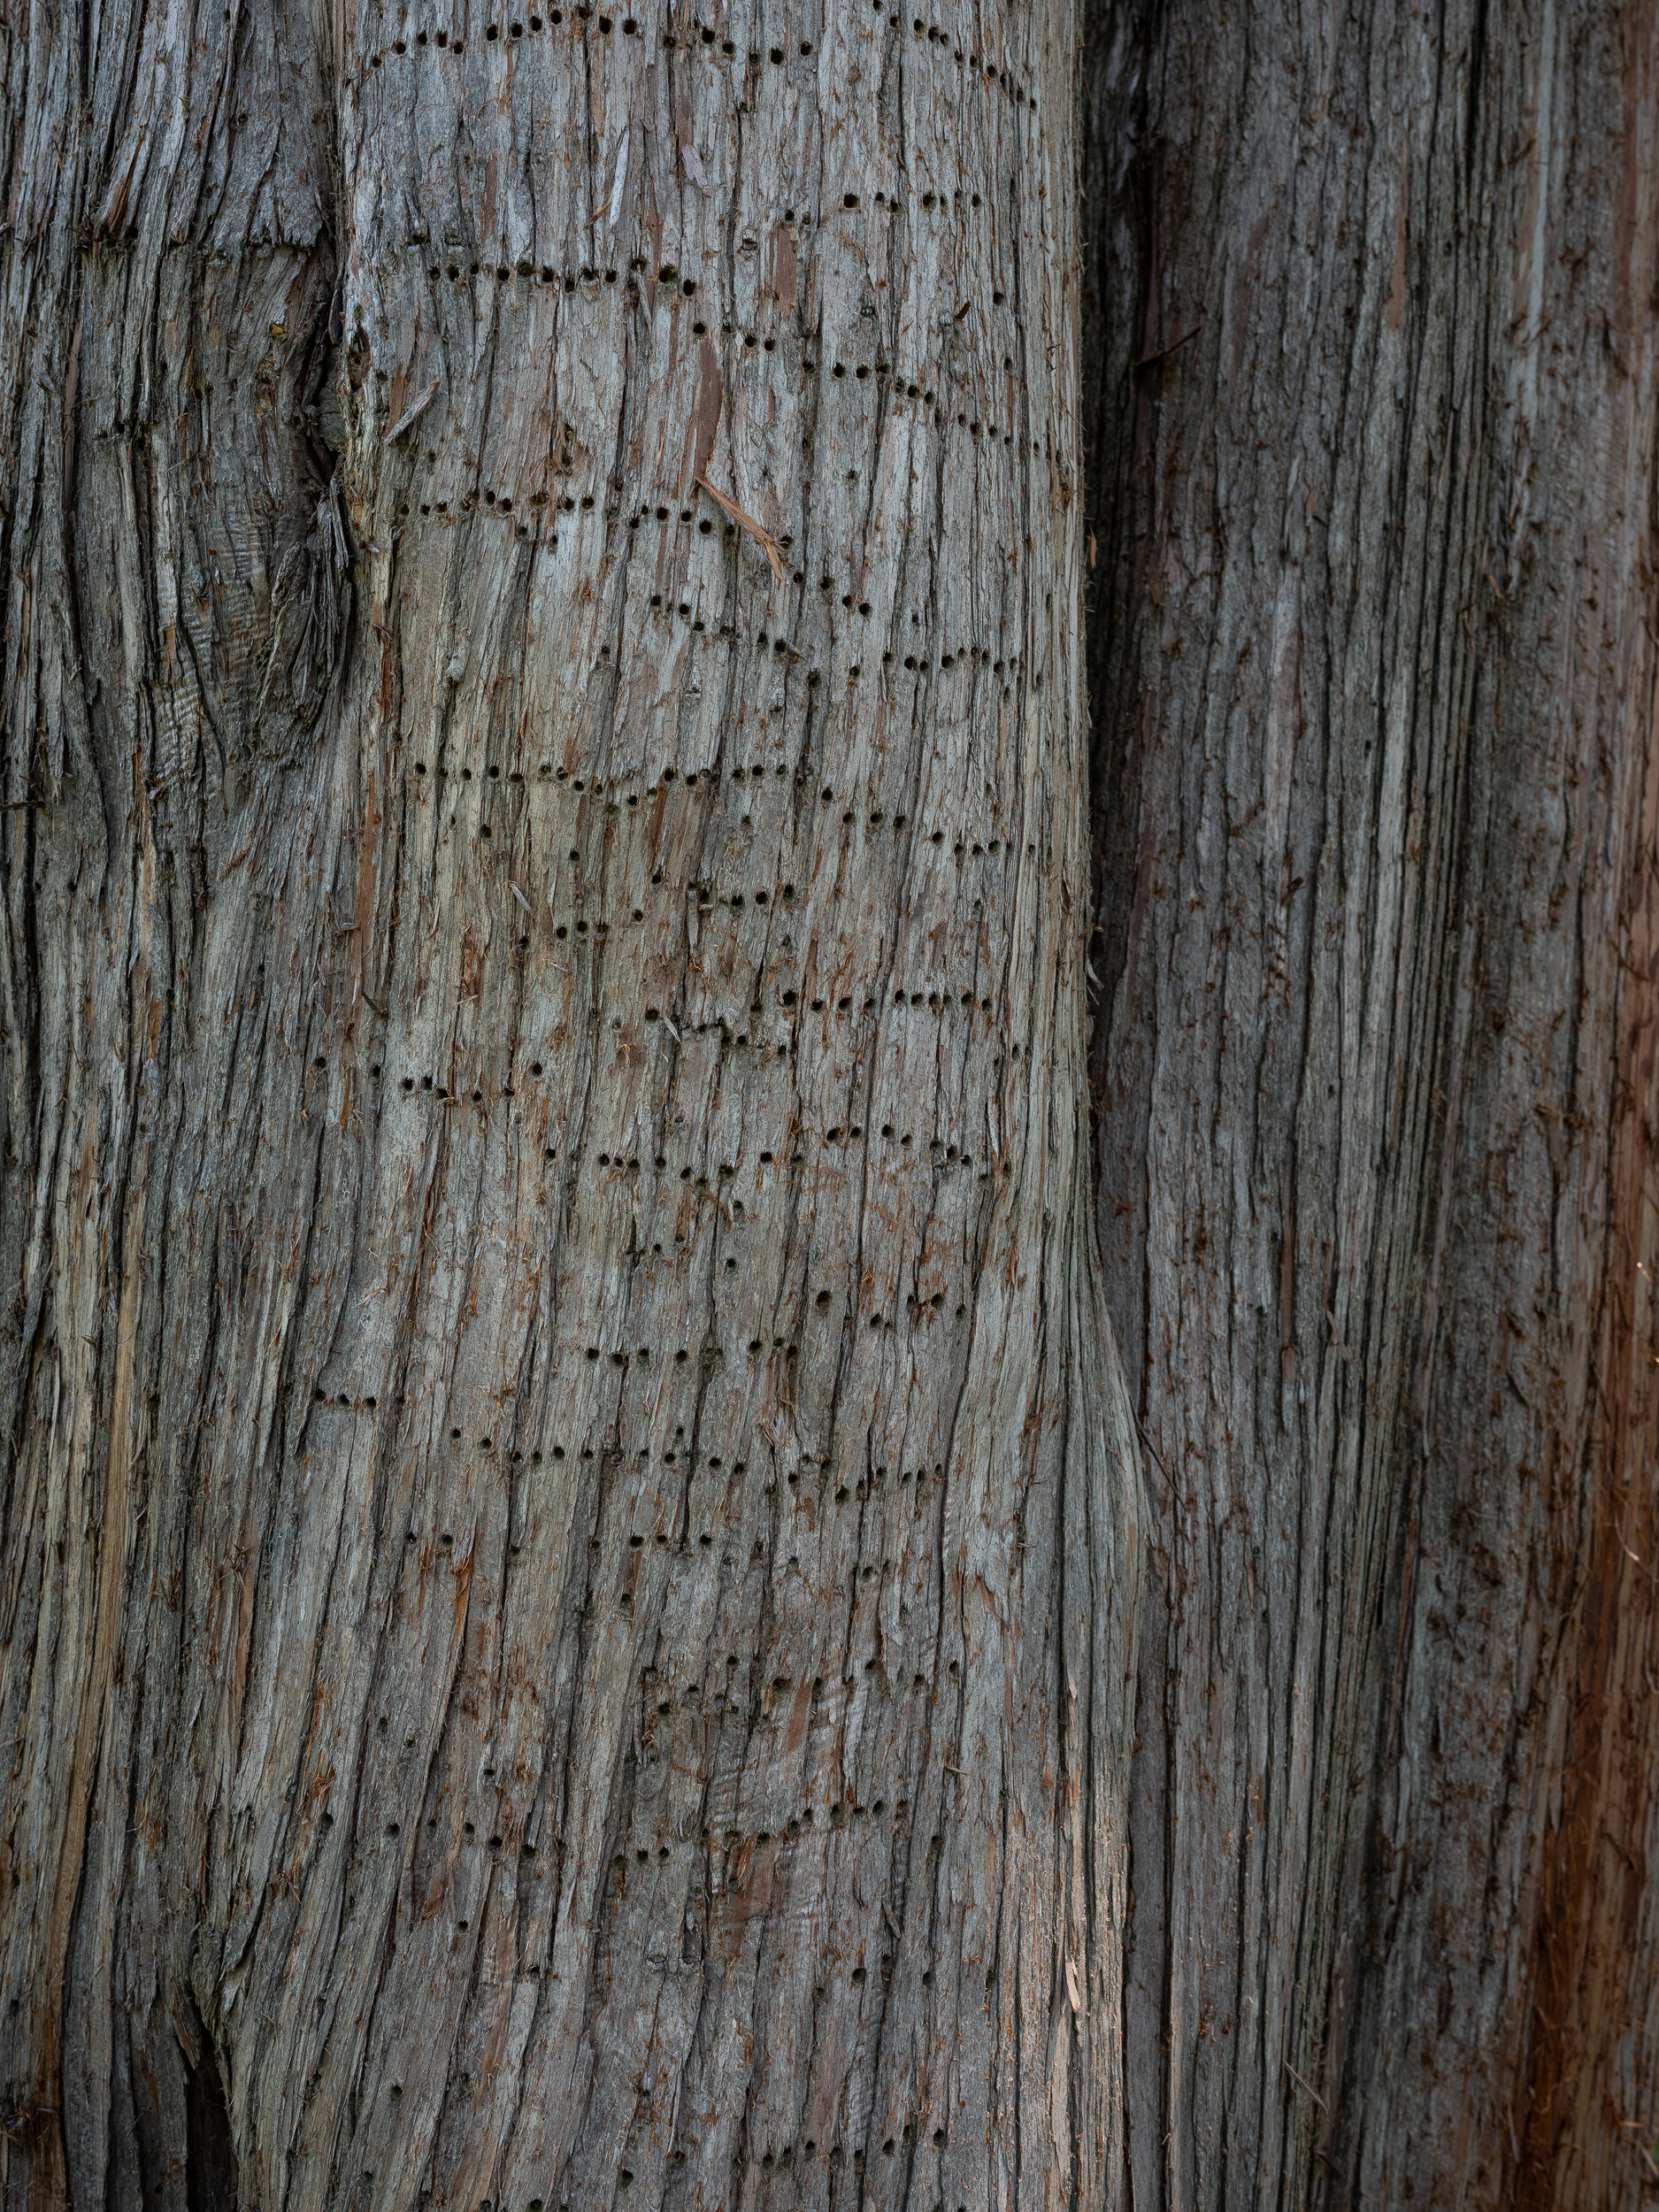 Woodpecker Trails, Waterford, Virginia, 2019